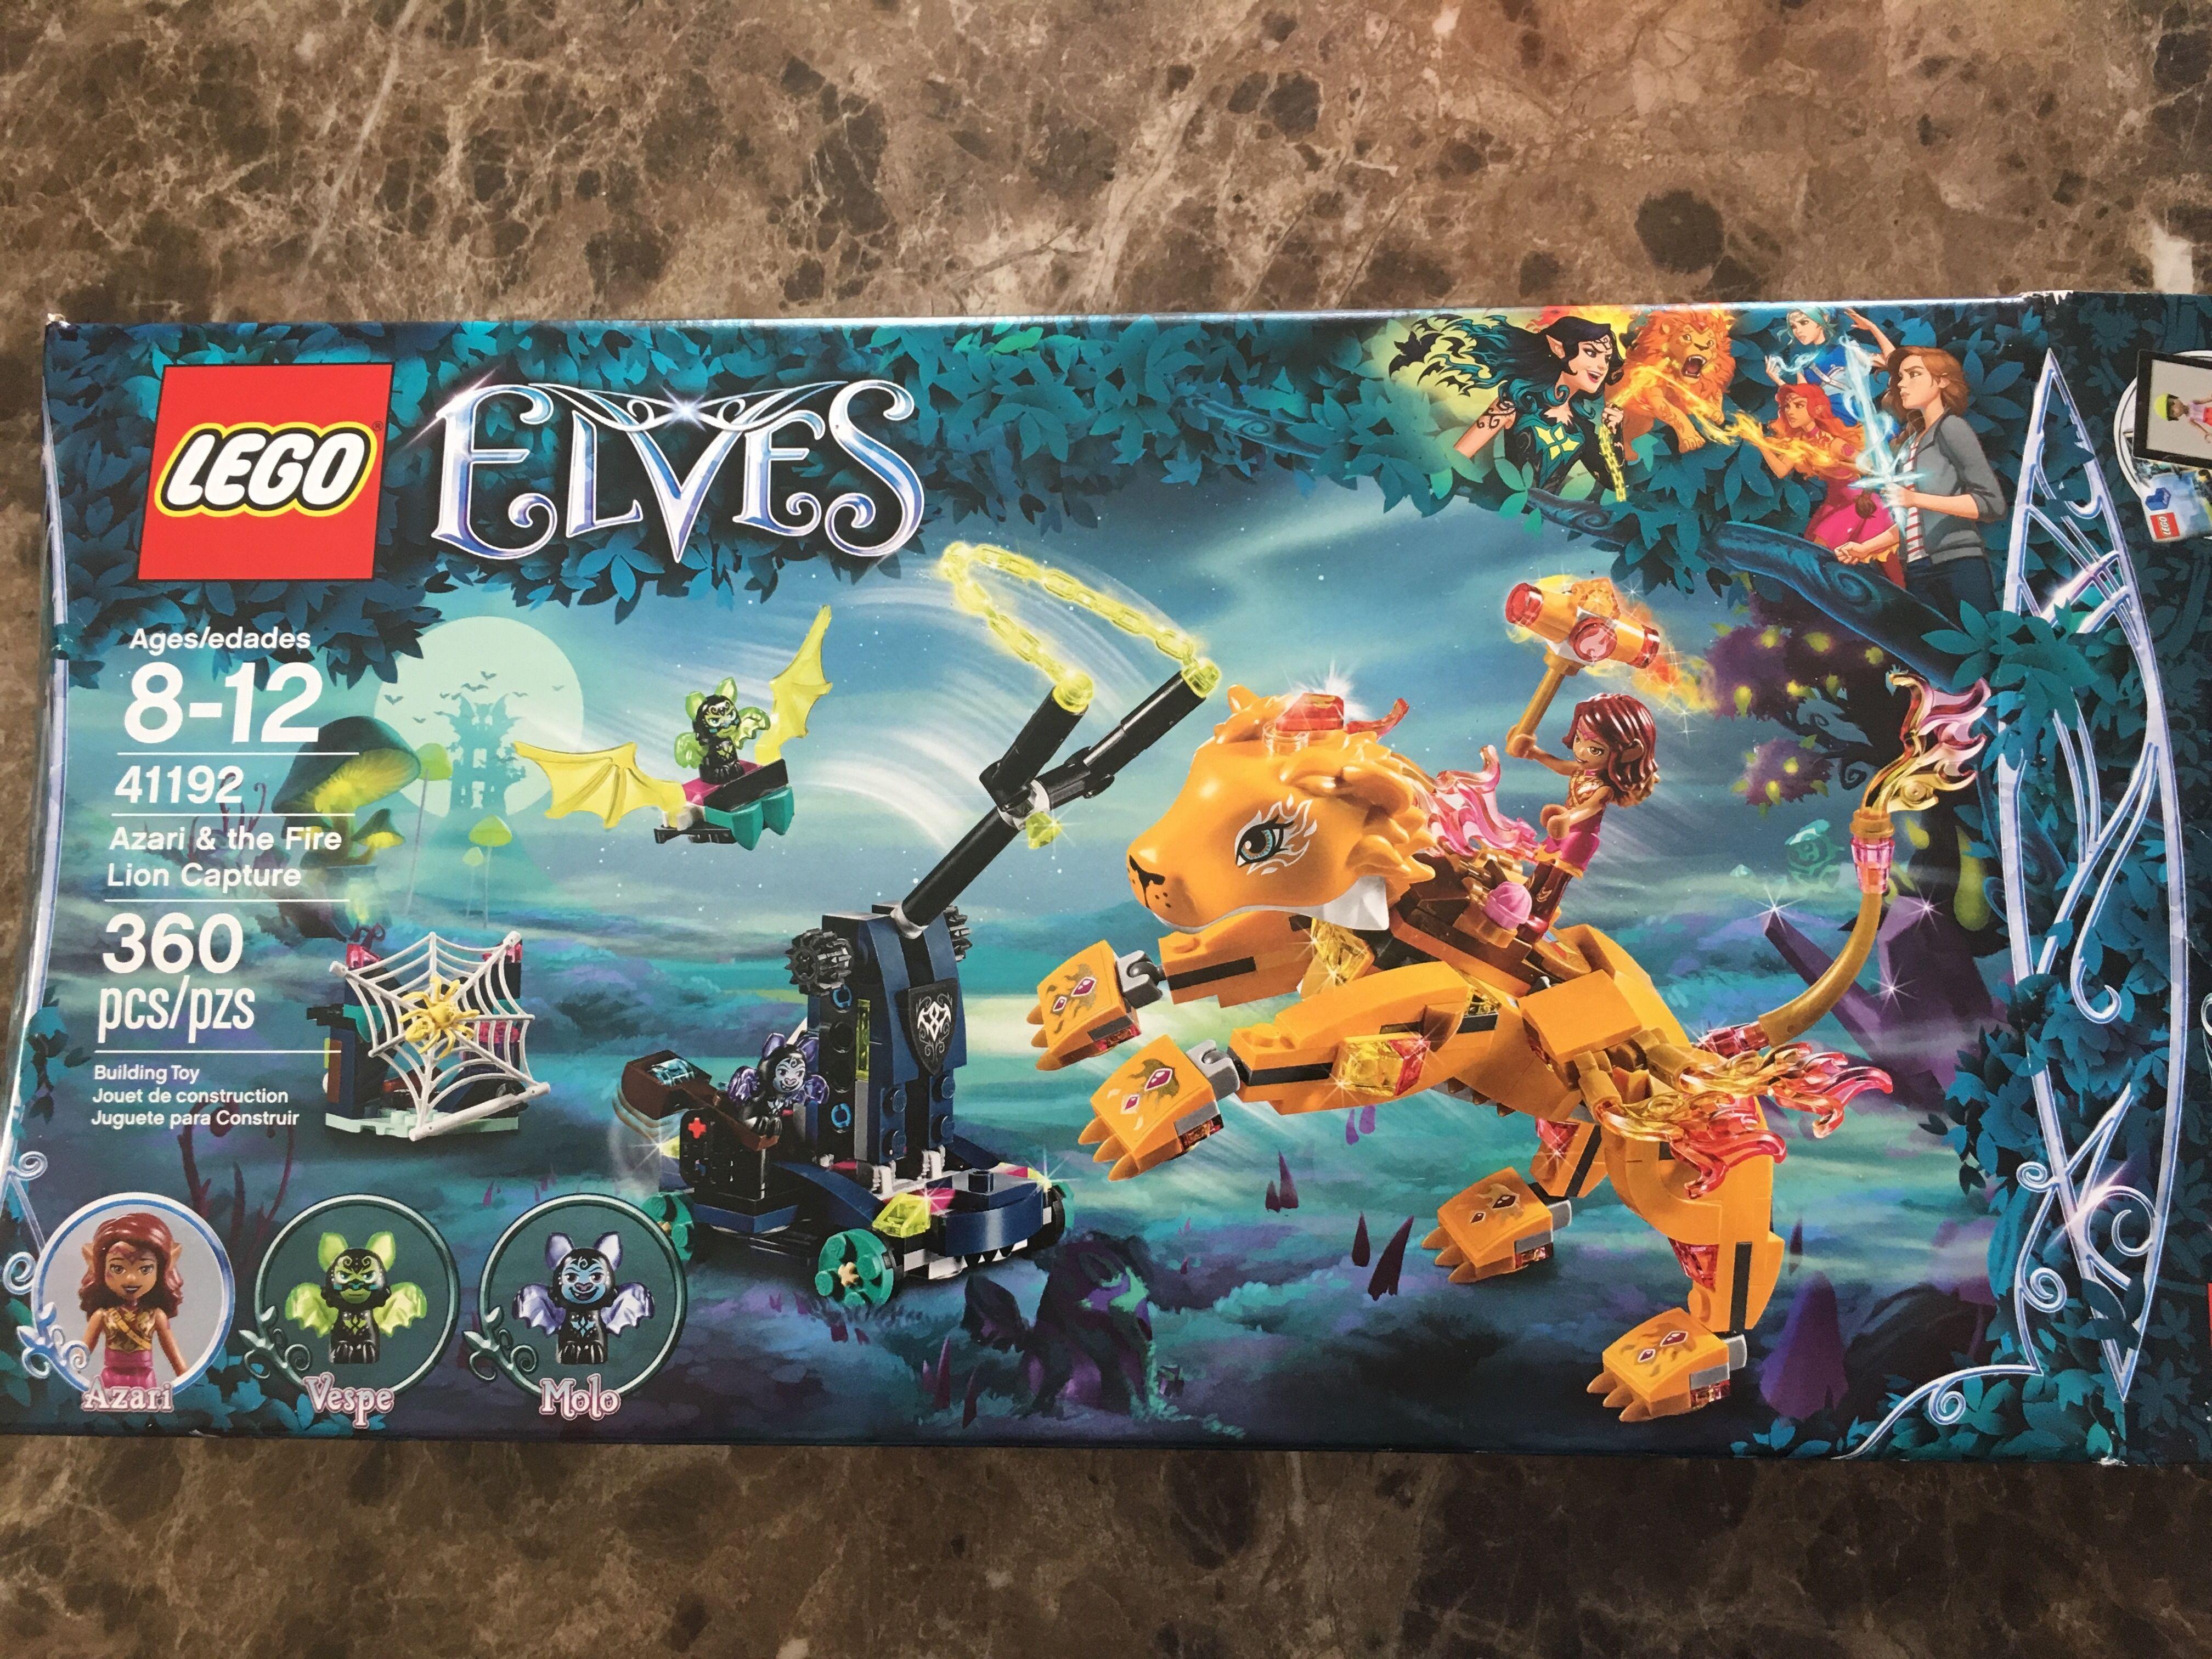 Lion Fire CaptureSets Lego 41192 The ElvesAzariamp; NnwkZO08XP